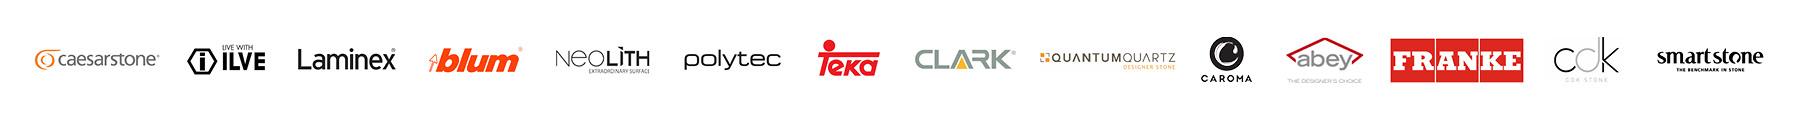 Apartment renovations Sydney Renopack trusted supplier brands